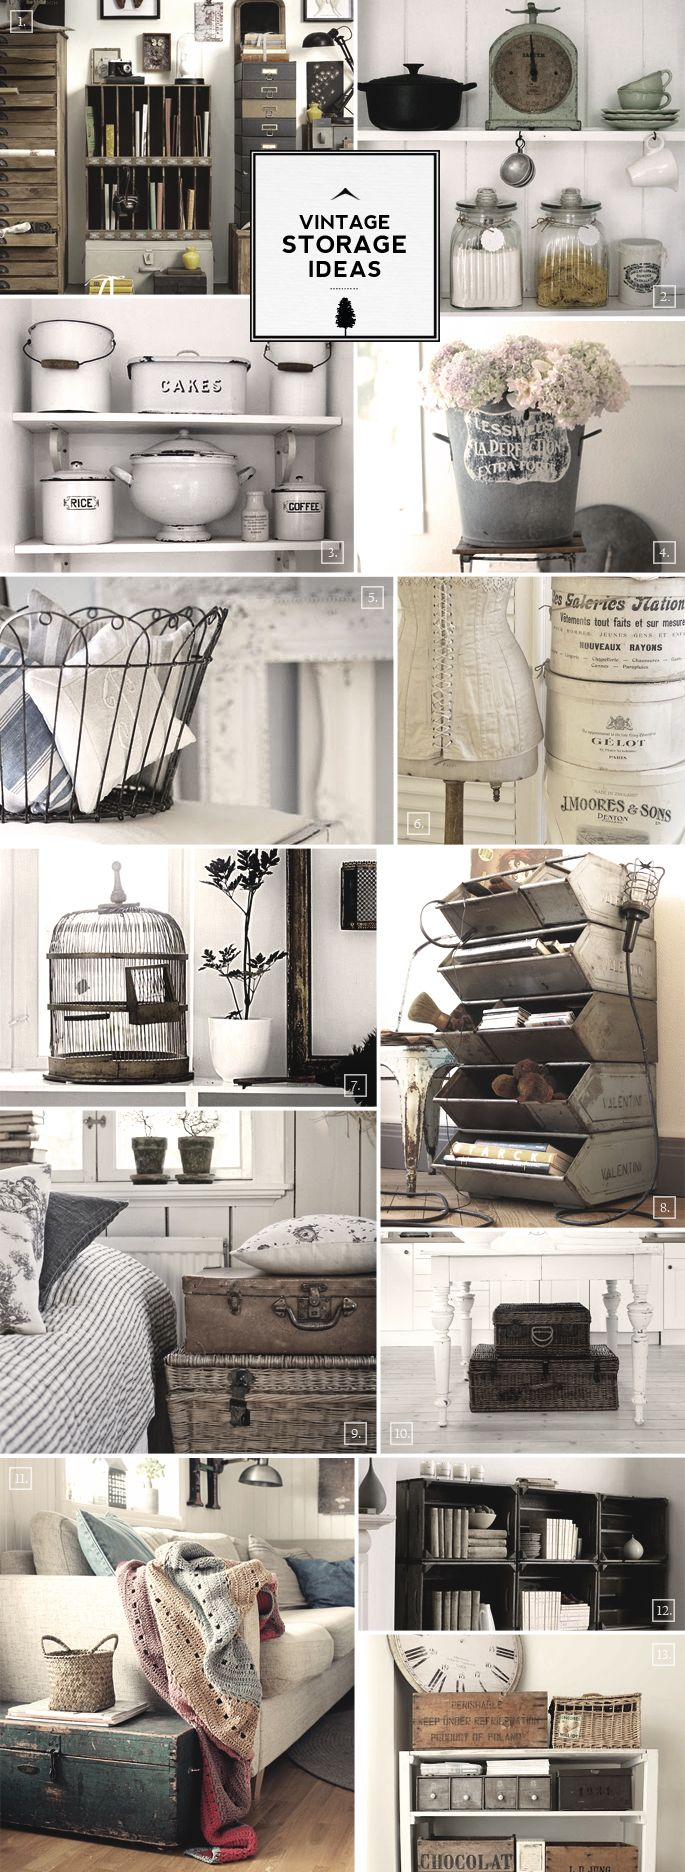 best images about vintage industrial on pinterest tea tins